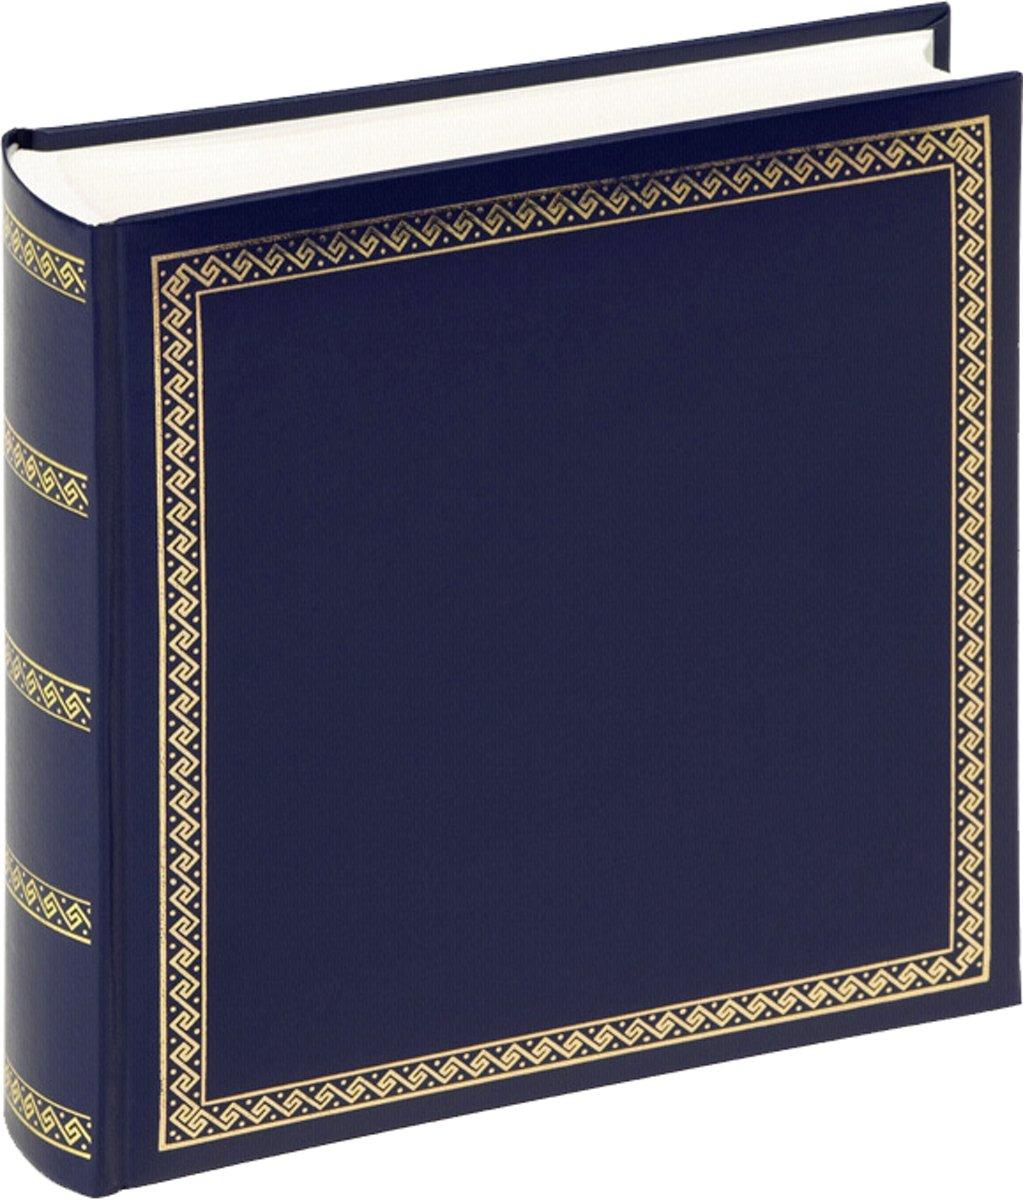 Walther Design Das schicke Dicke - Fotoalbum - 26 x 25 cm - Blauw - 100 pagina's